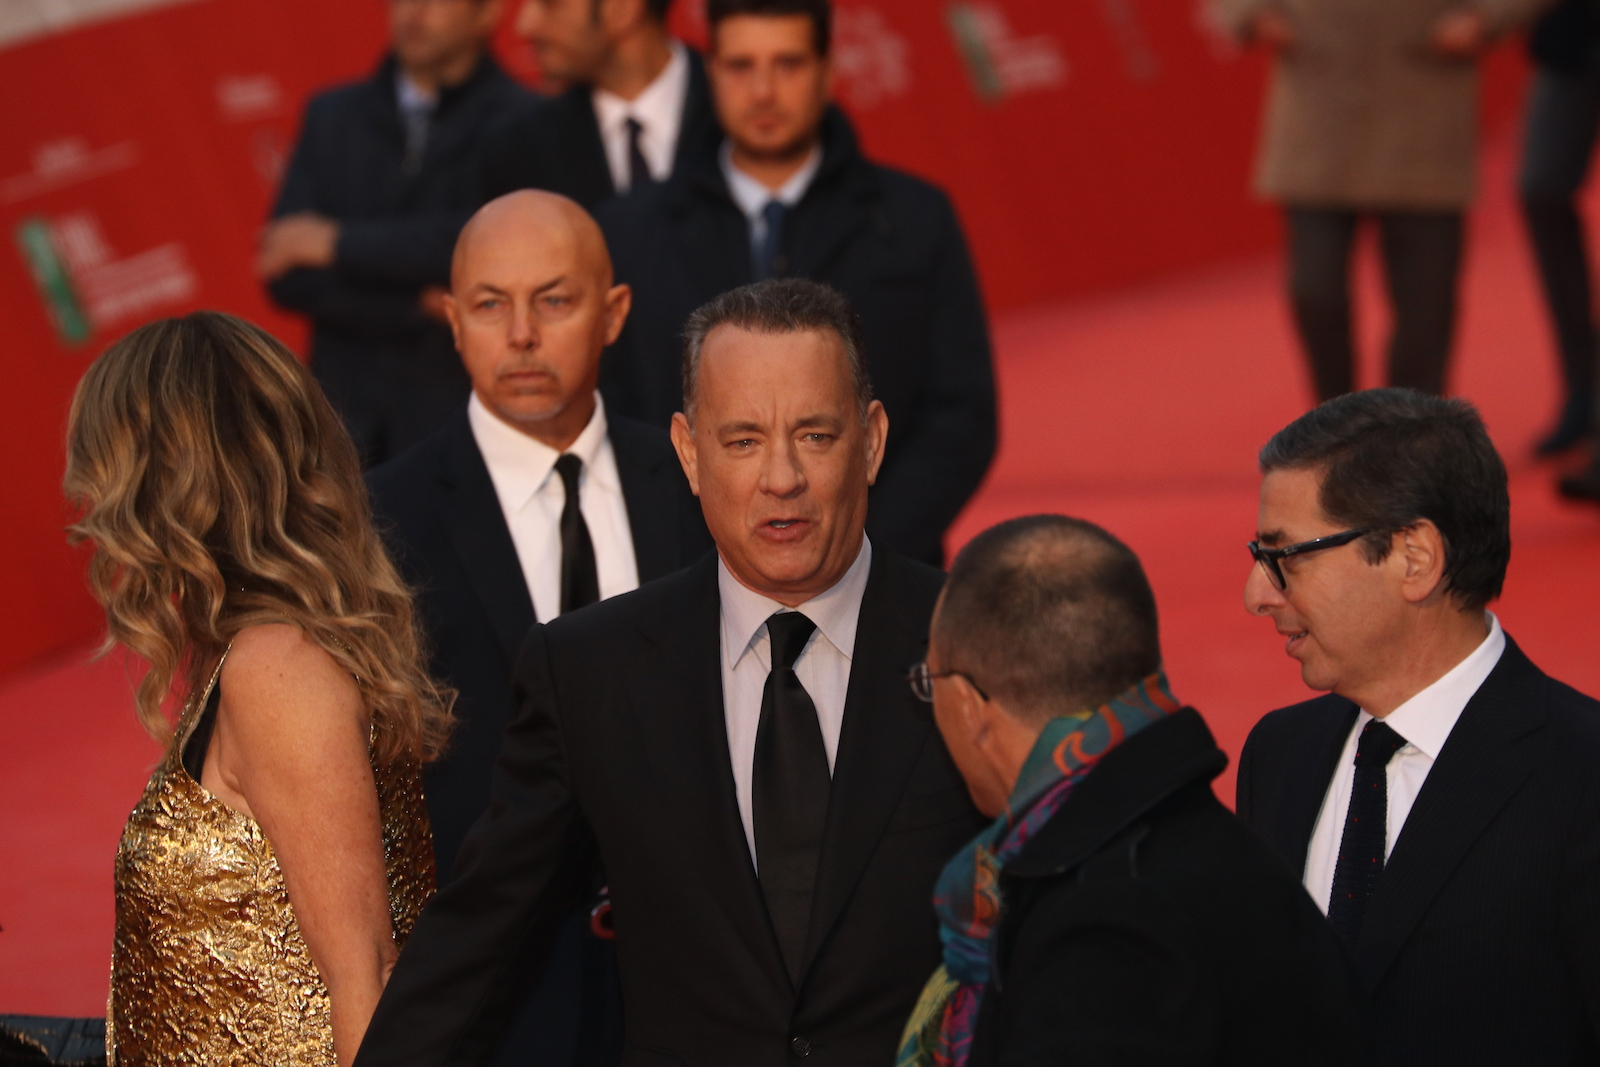 Roma 2016: Tom Hanks mentre attraversa il red carpet